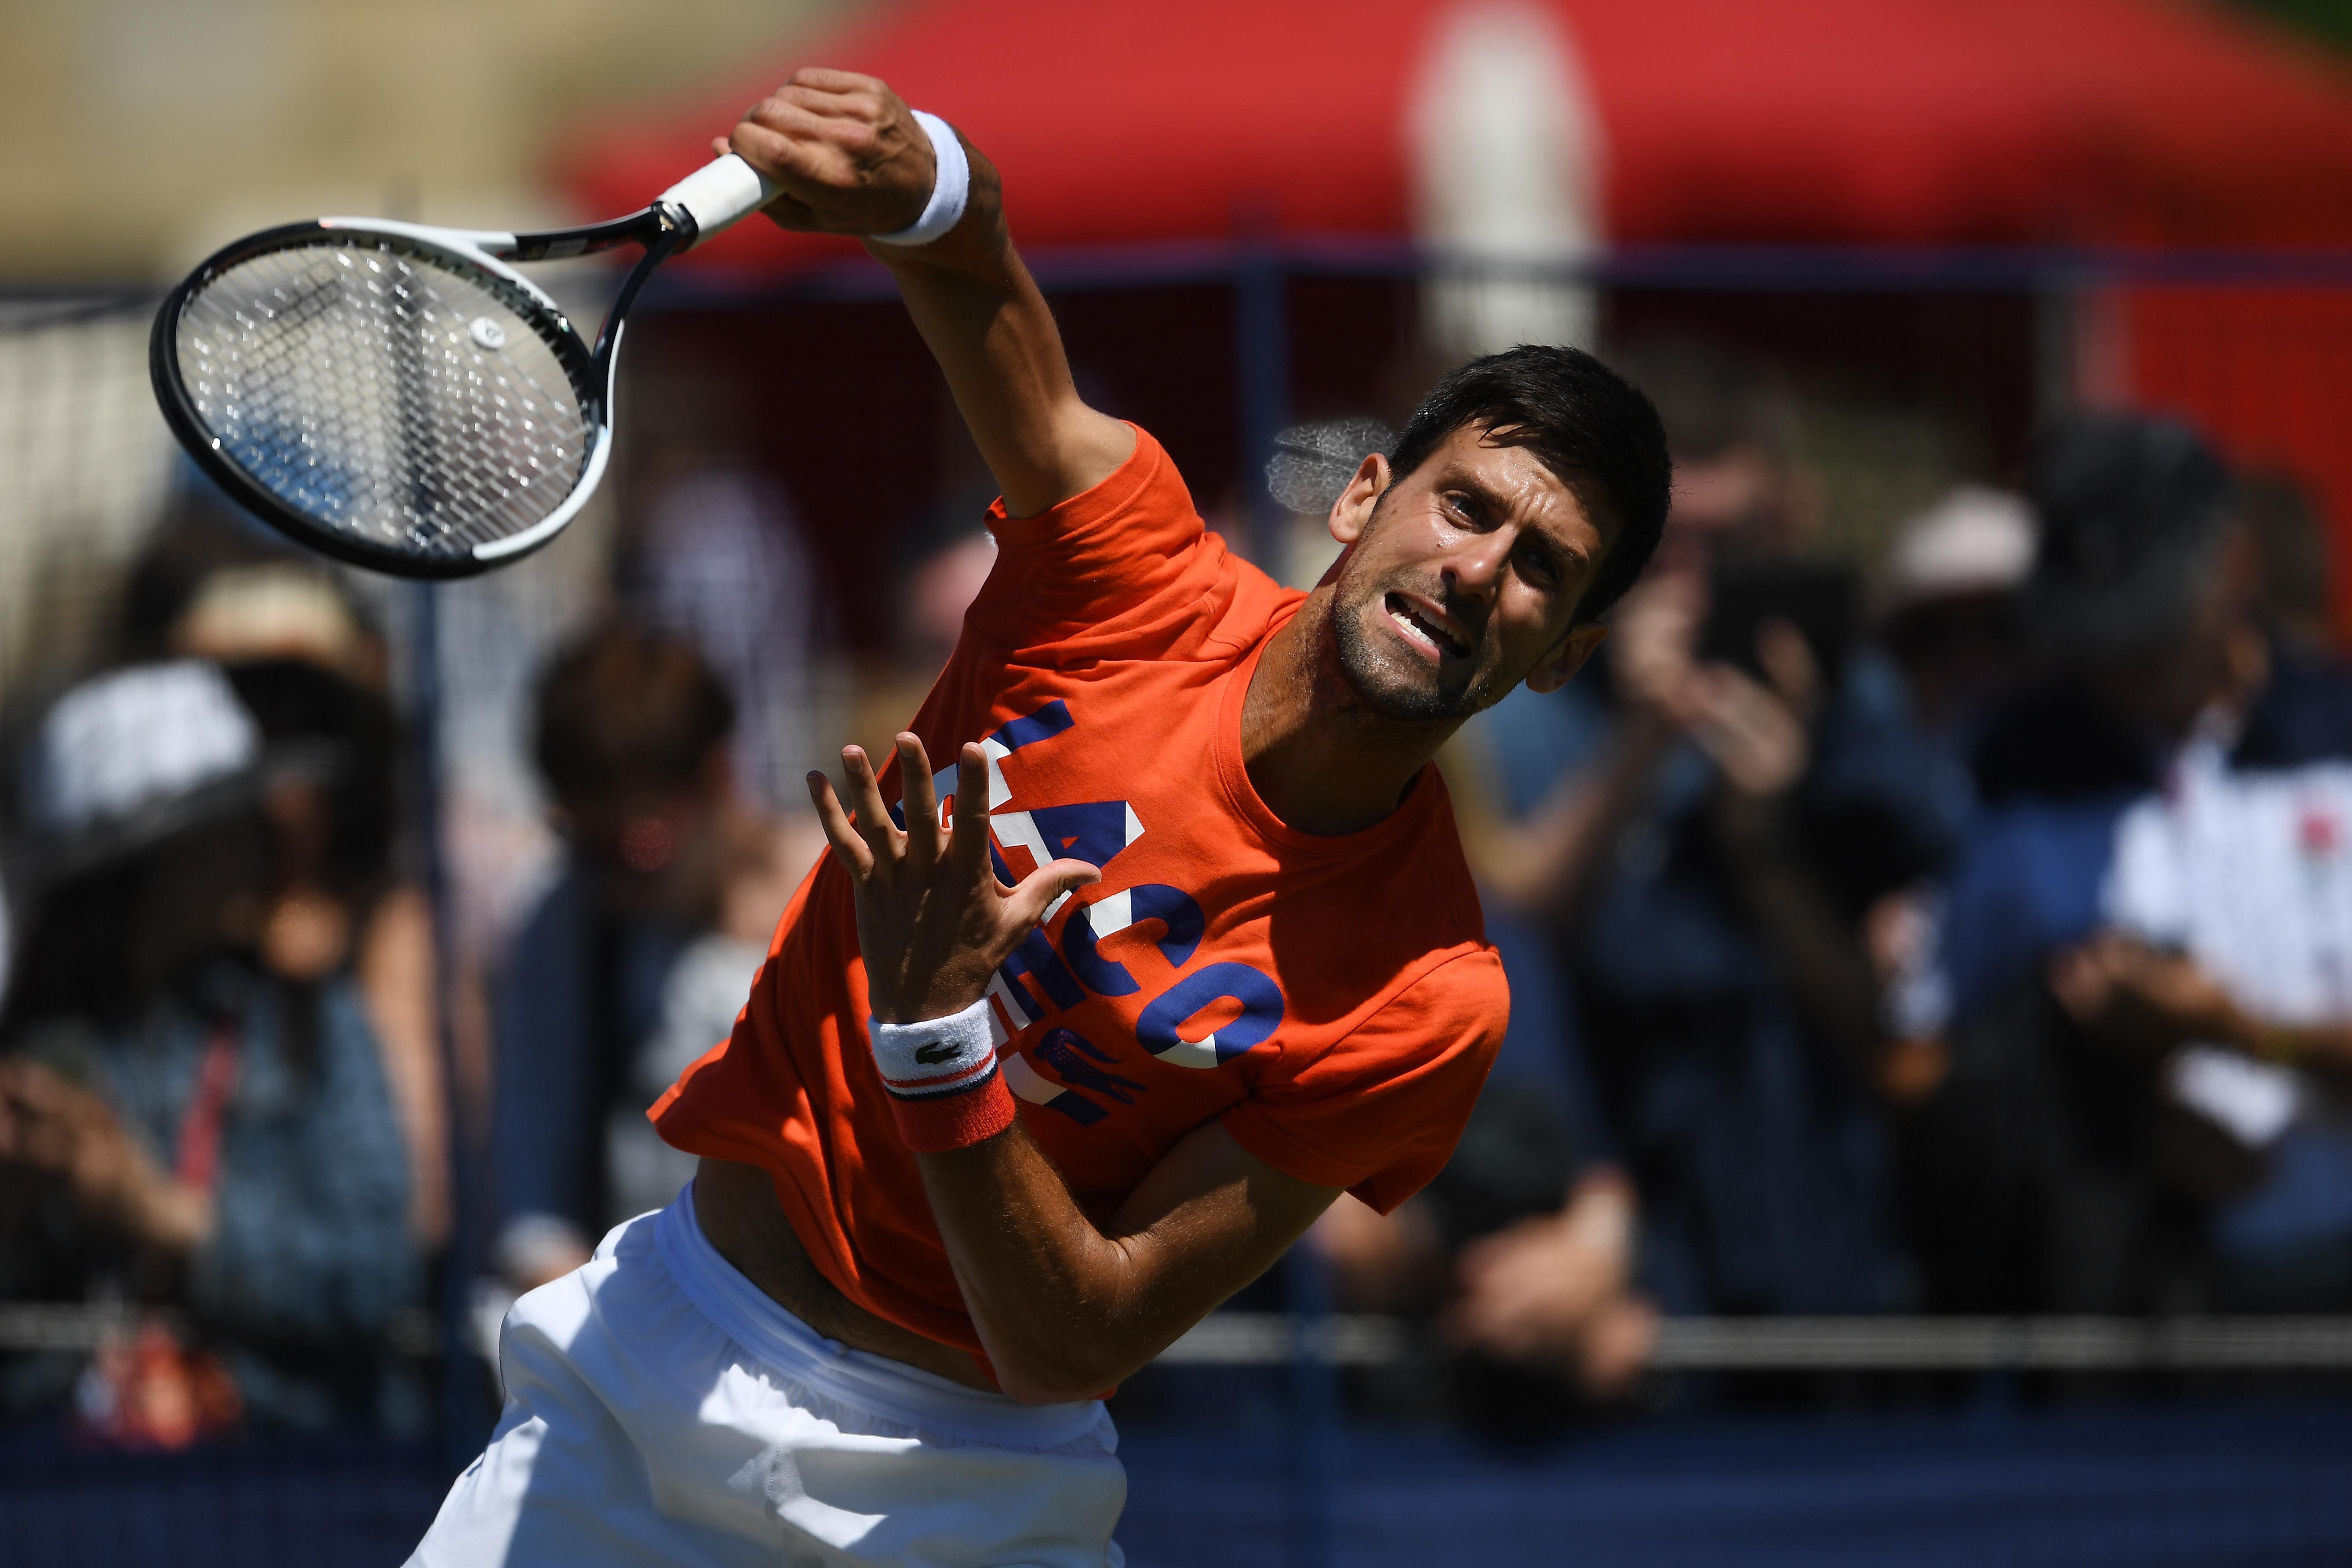 Michael Kohlmann tippt Novak Djokovic als Wimbledonsieger. 2015 konnte der Serbe das Turnier zuletzt gewinnen.